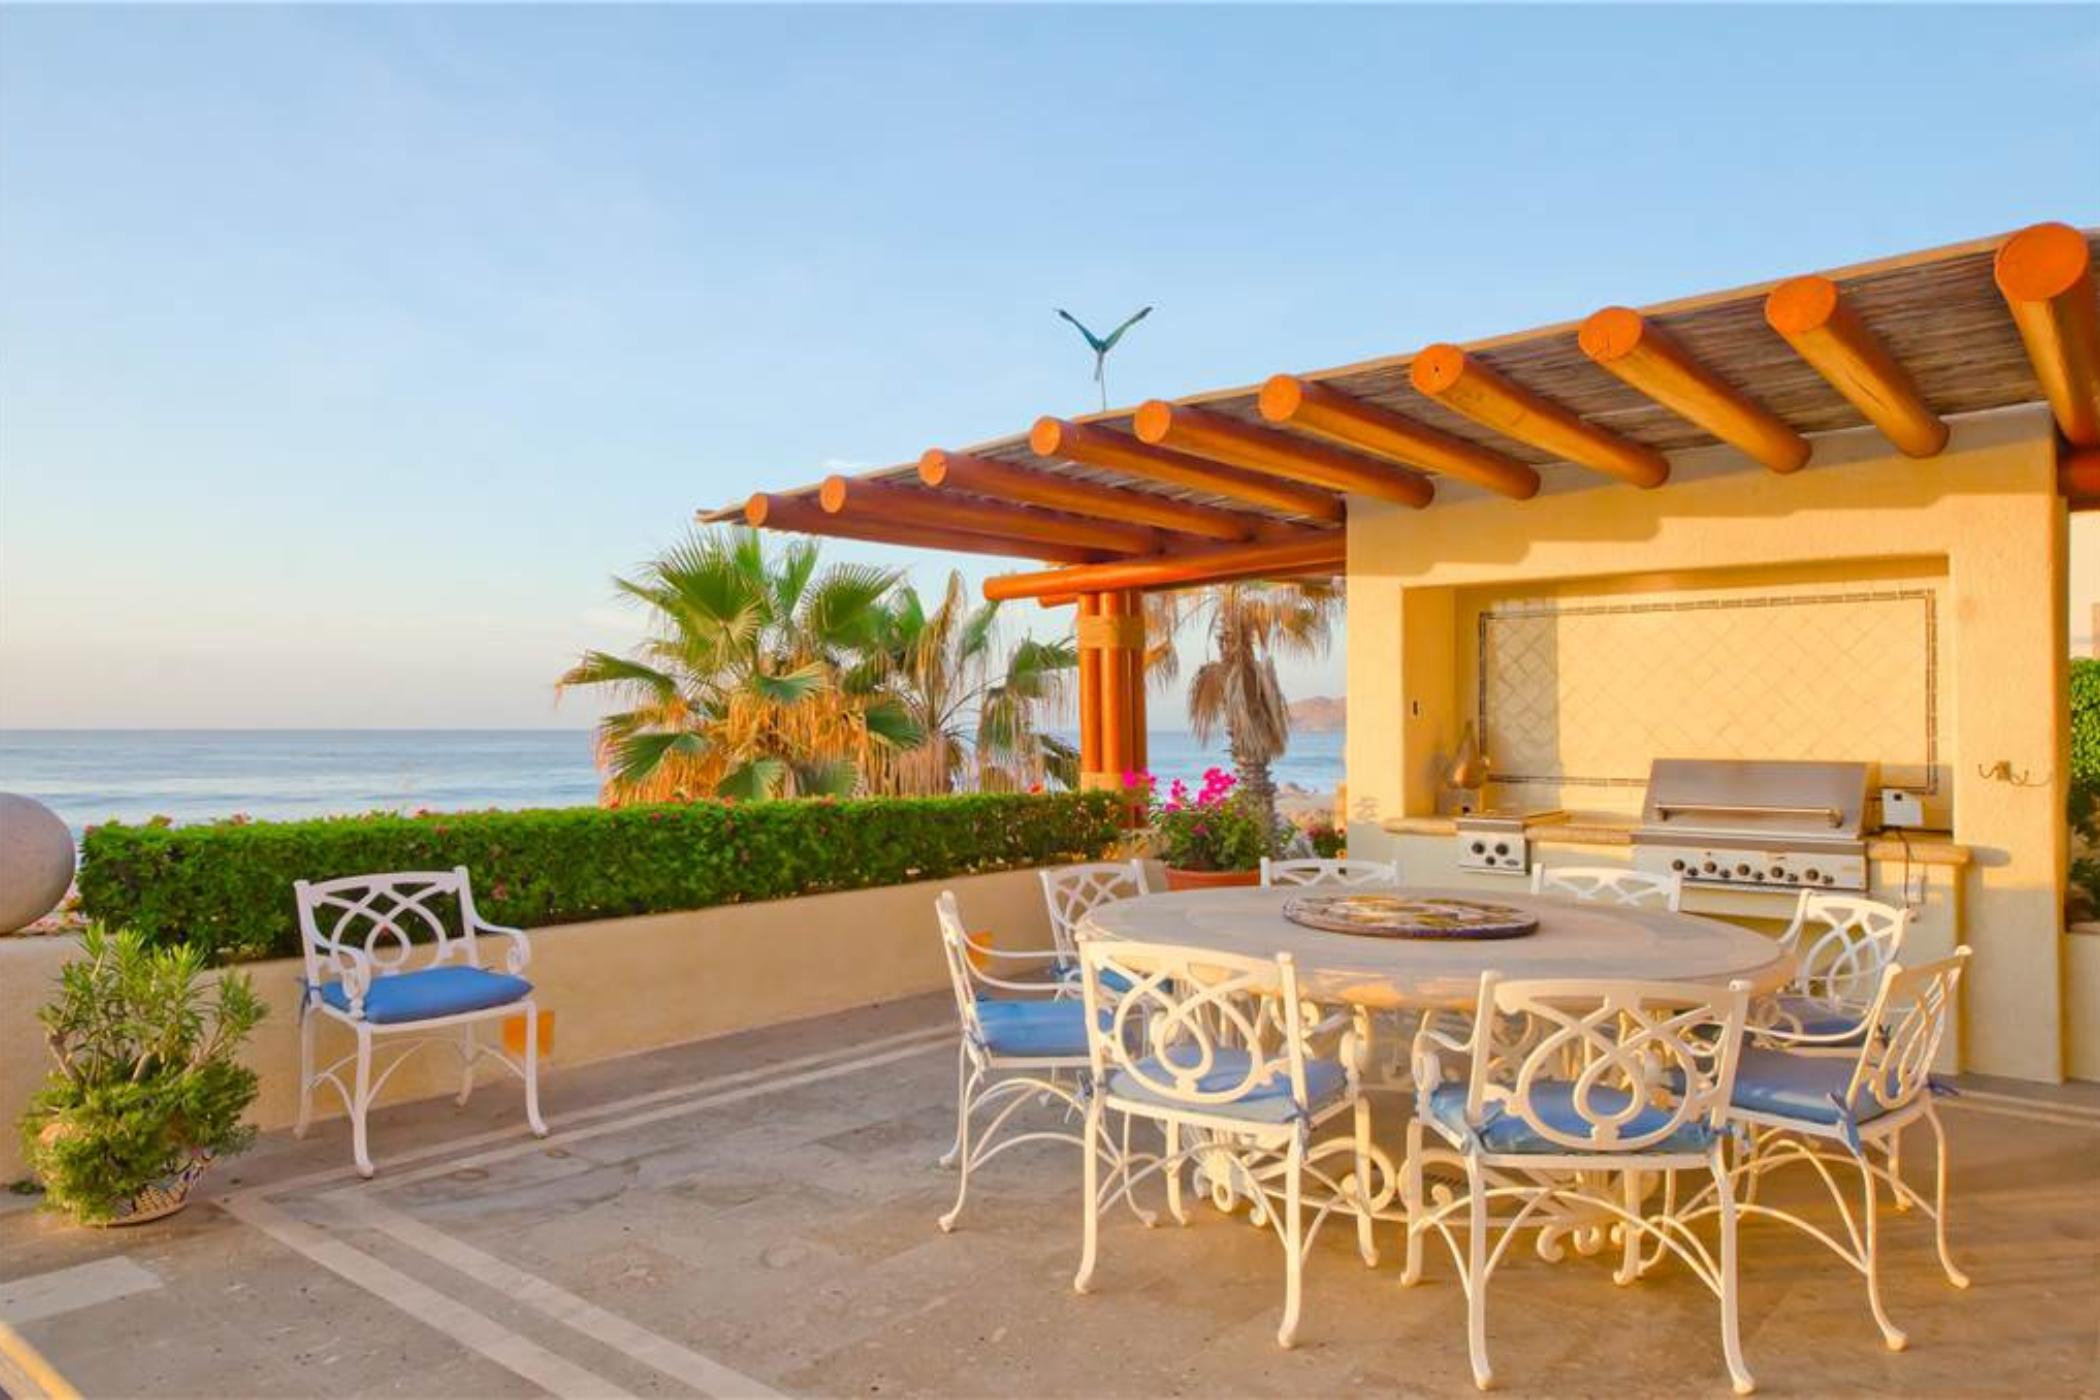 Villa de la Playa